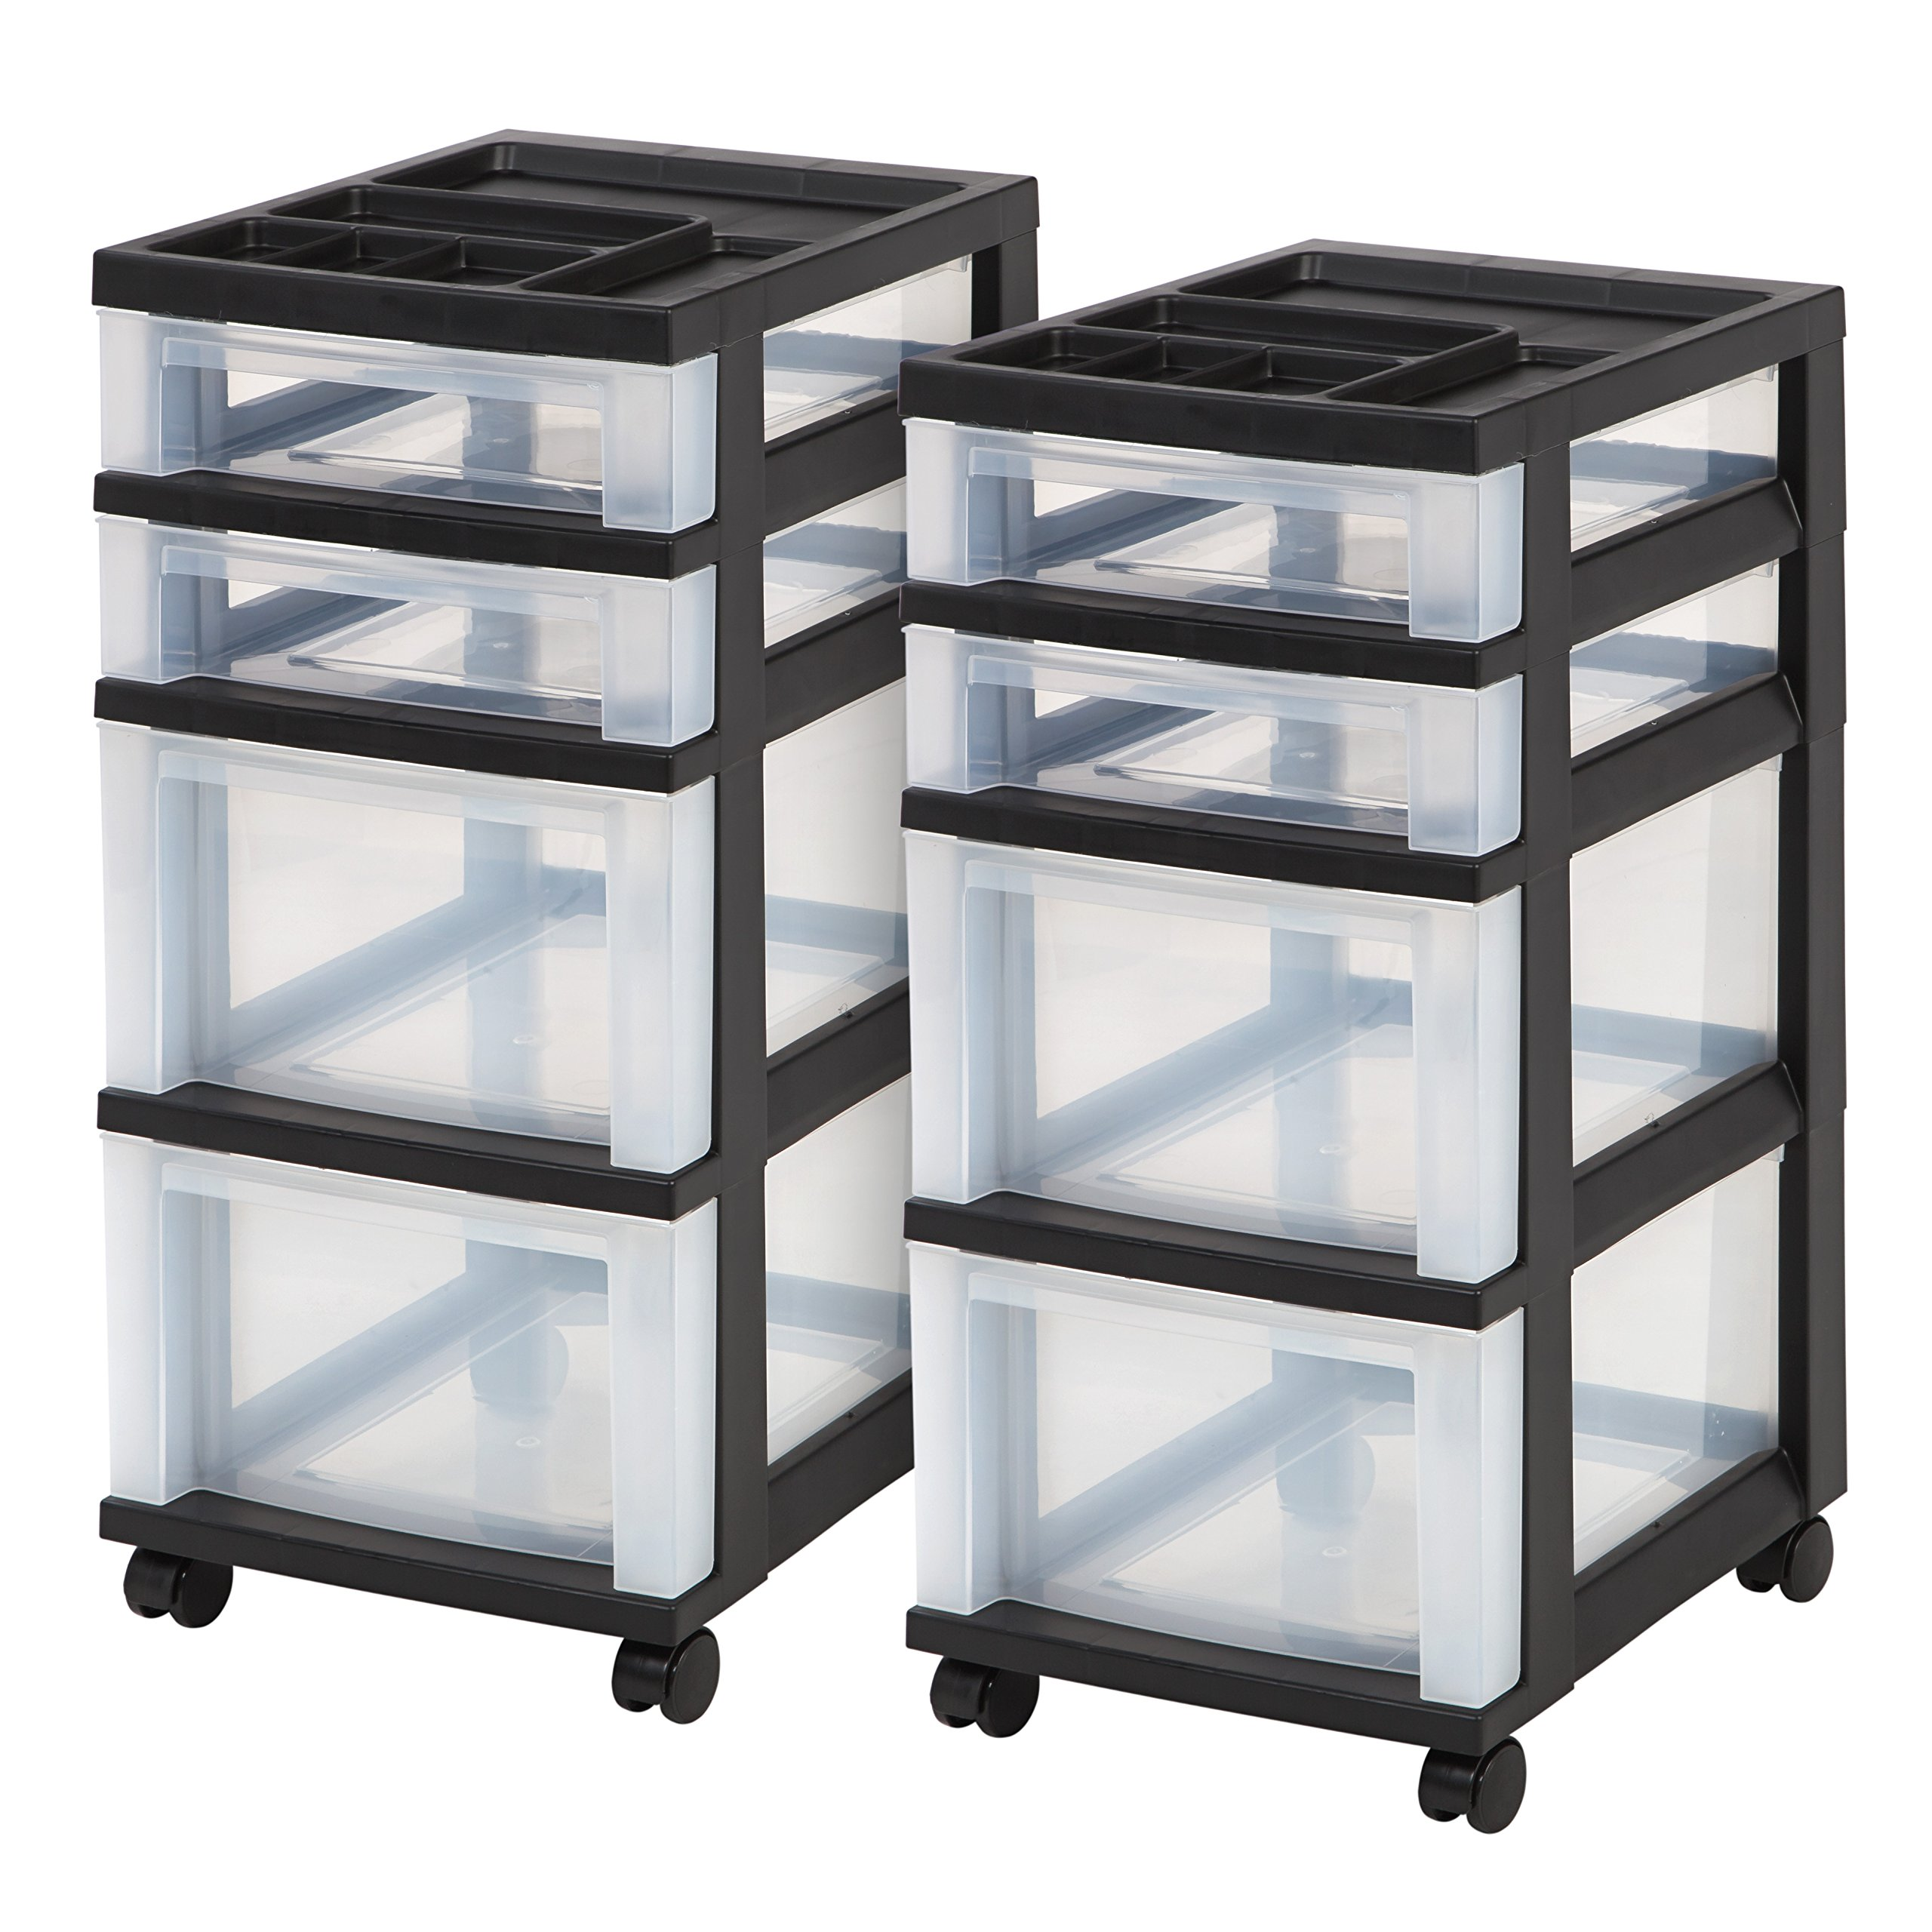 IRIS 4-Drawer Rolling Storage Cart with Organizer Top, Black, 2 Pack by IRIS USA, Inc.